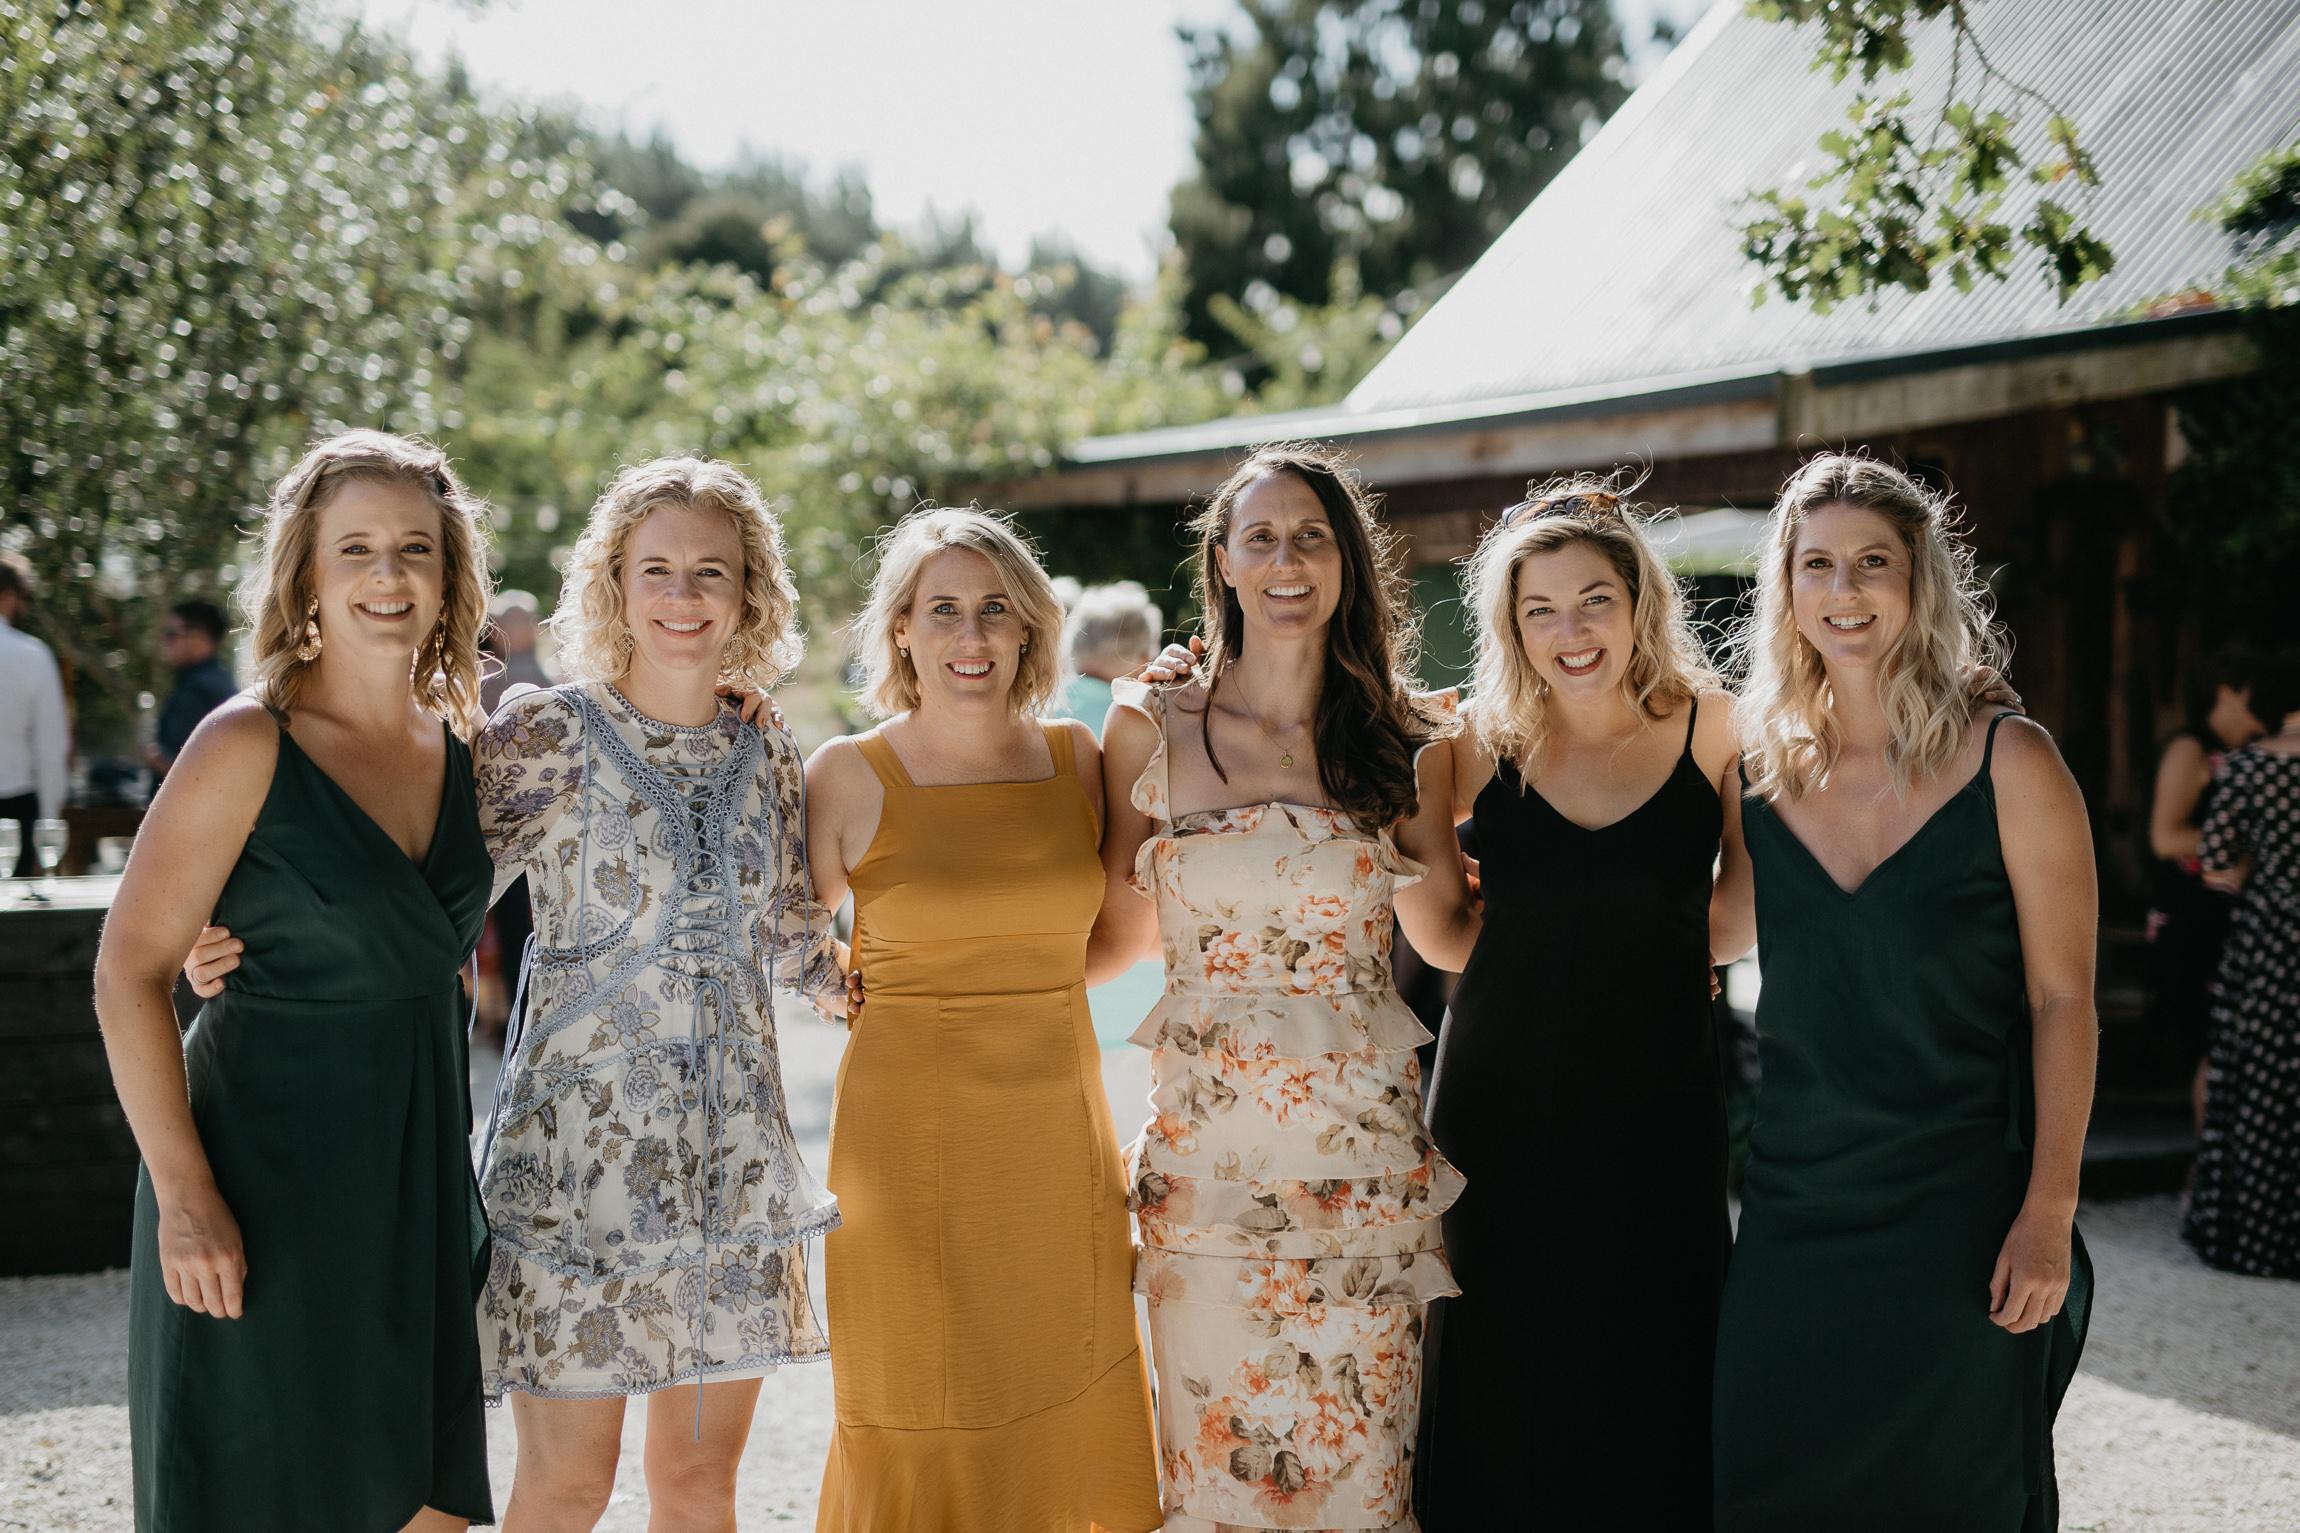 oldforestschool-wedding-blog-136.jpg